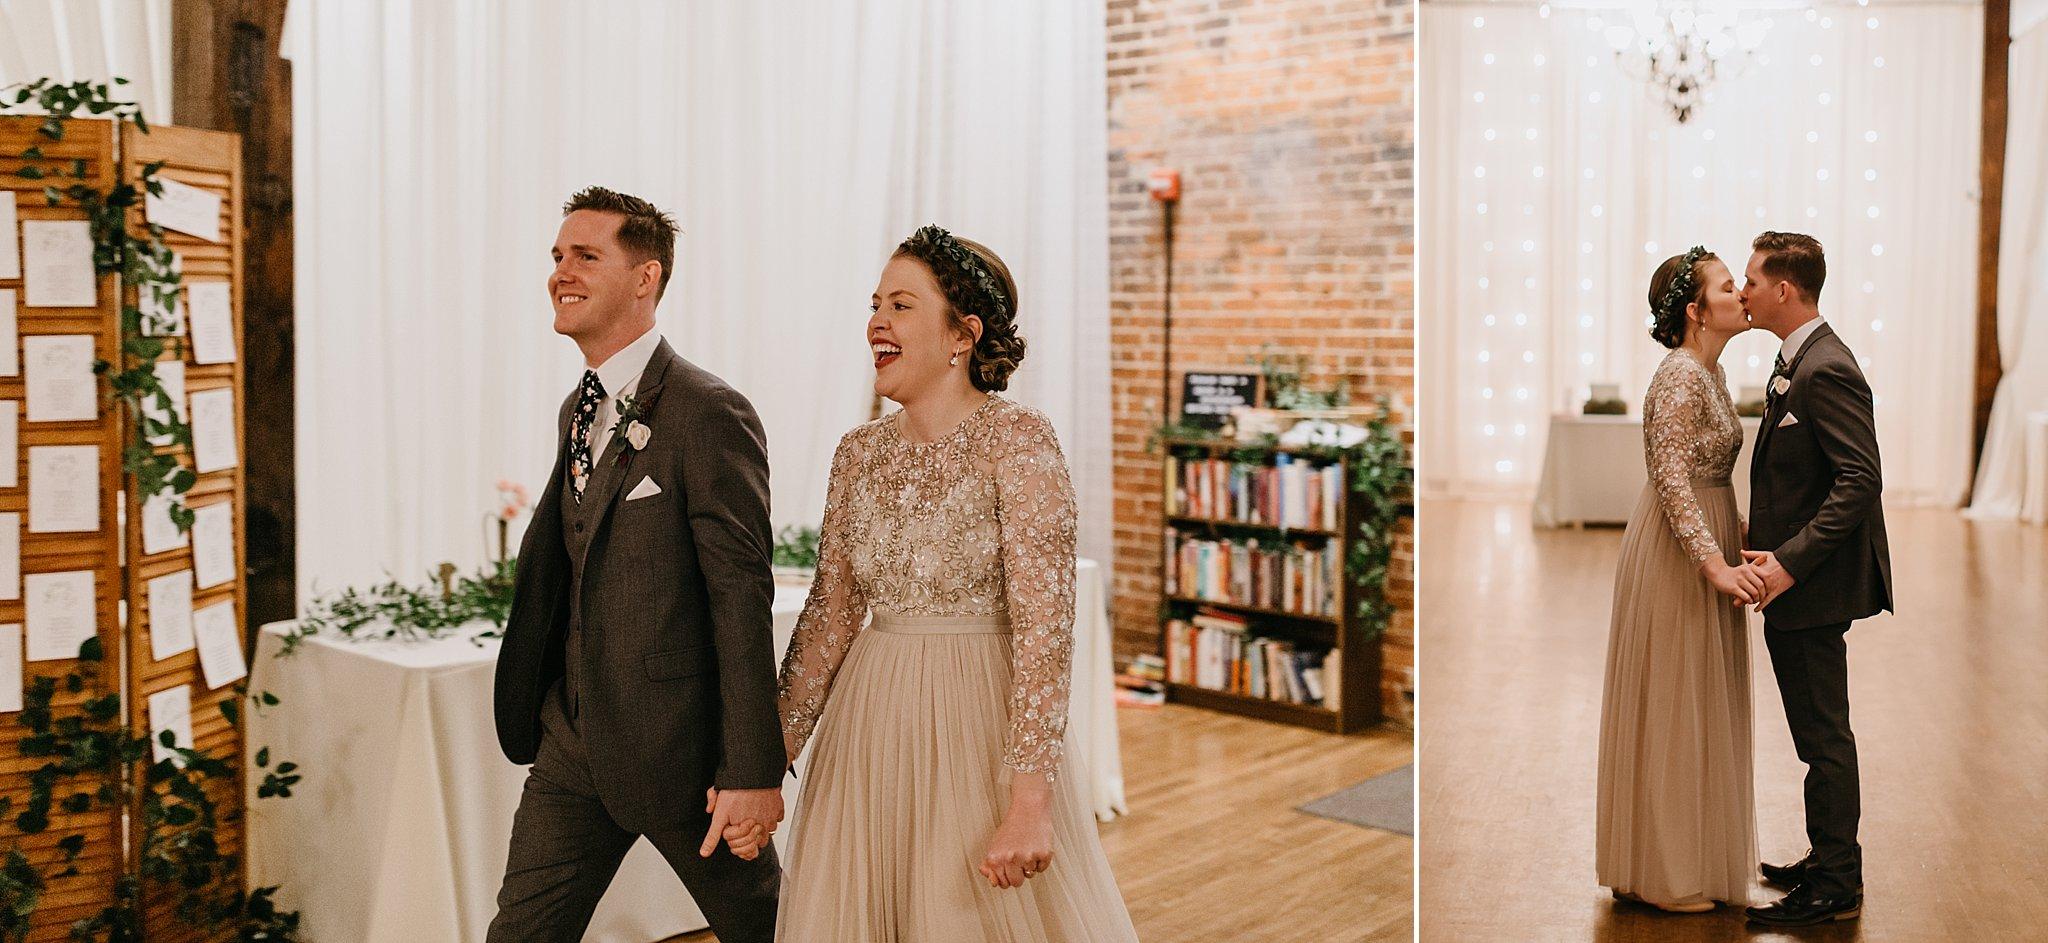 Wilderlove Co_Waco Texas_The Phoenix_Romantic Wedding Photography_0079.jpg